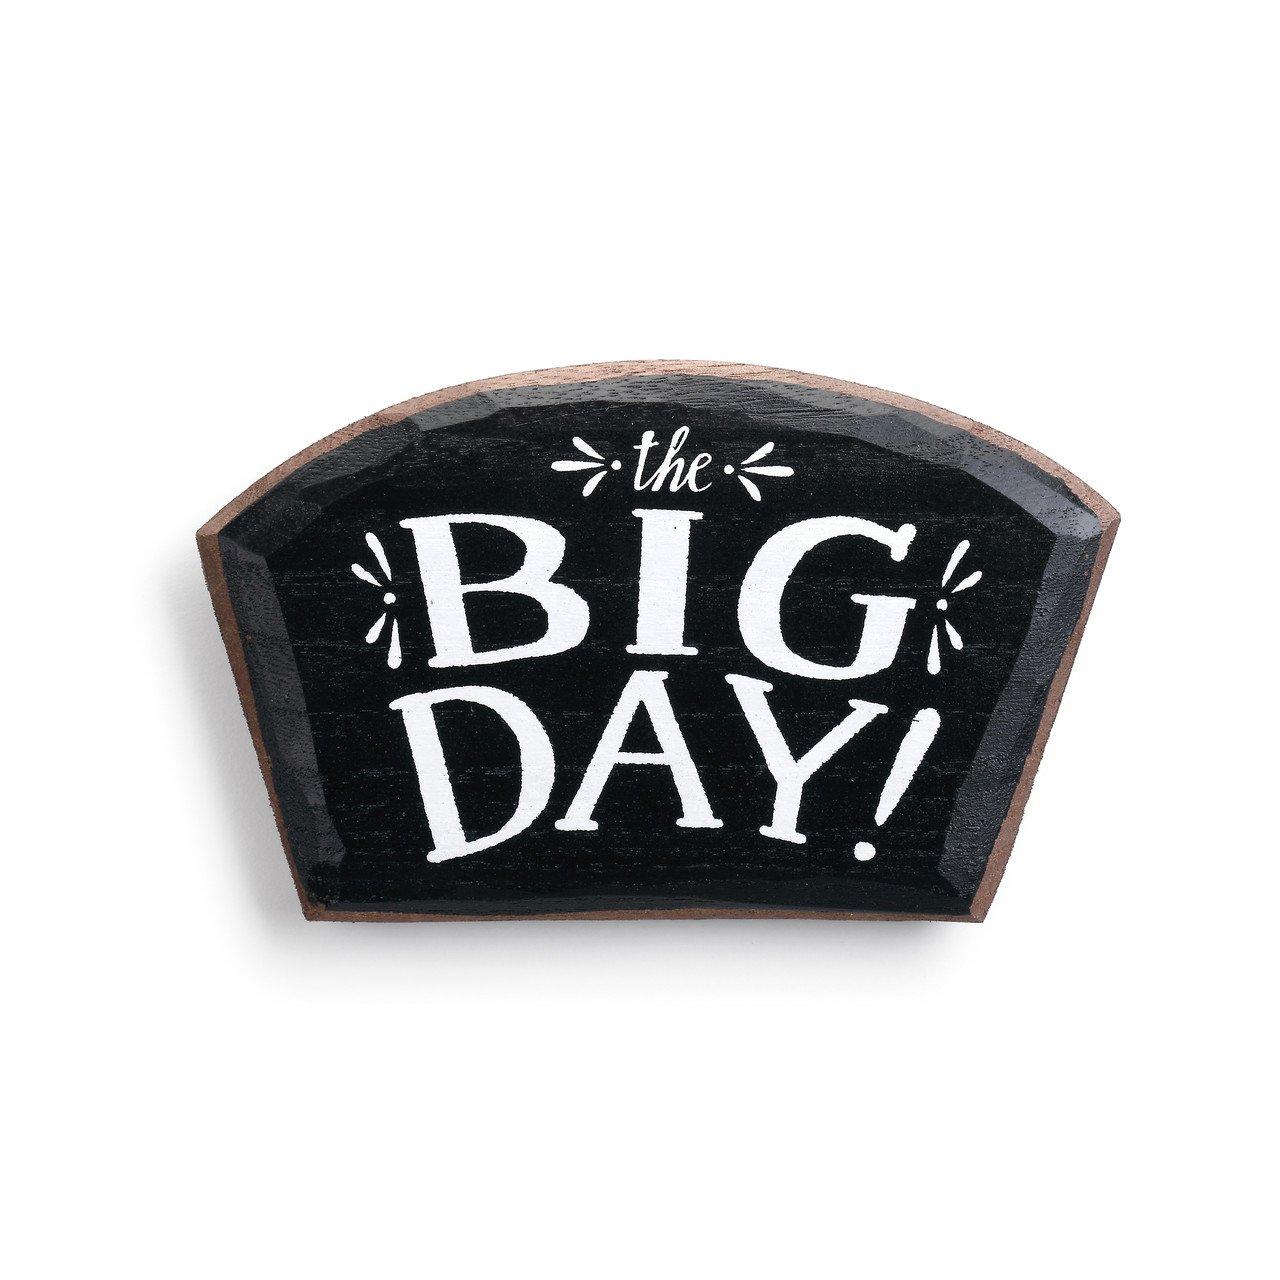 The Big Day Seasonal White On Black 7 x 6 Paulownia Wood Magnetic Token